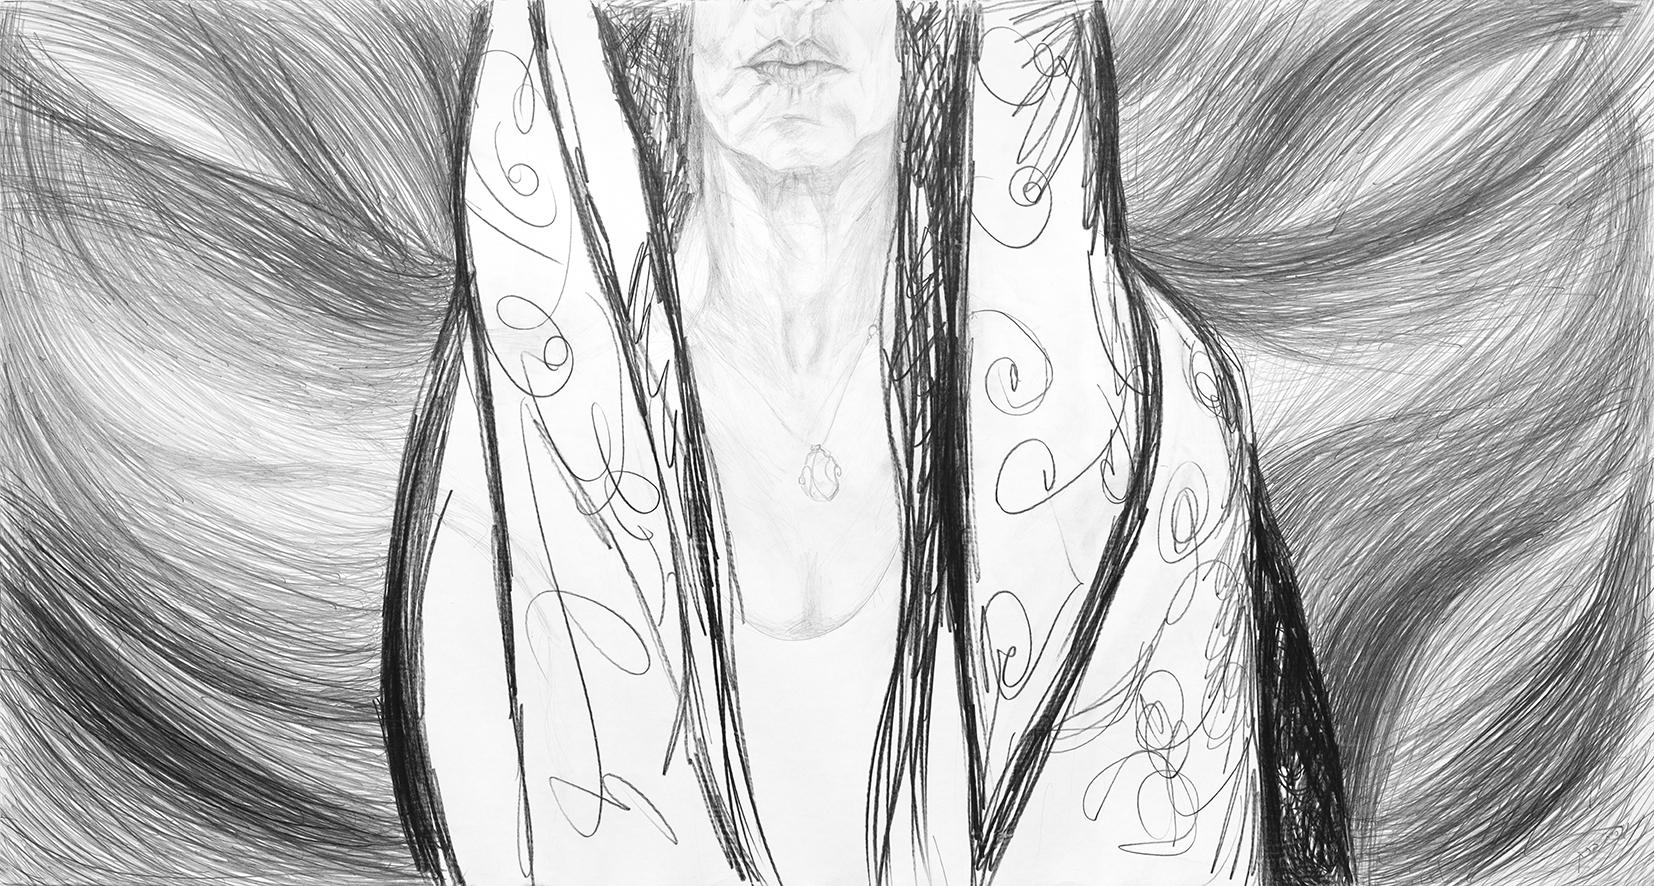 Under armored wings #6 By Nurit Barak kachtan